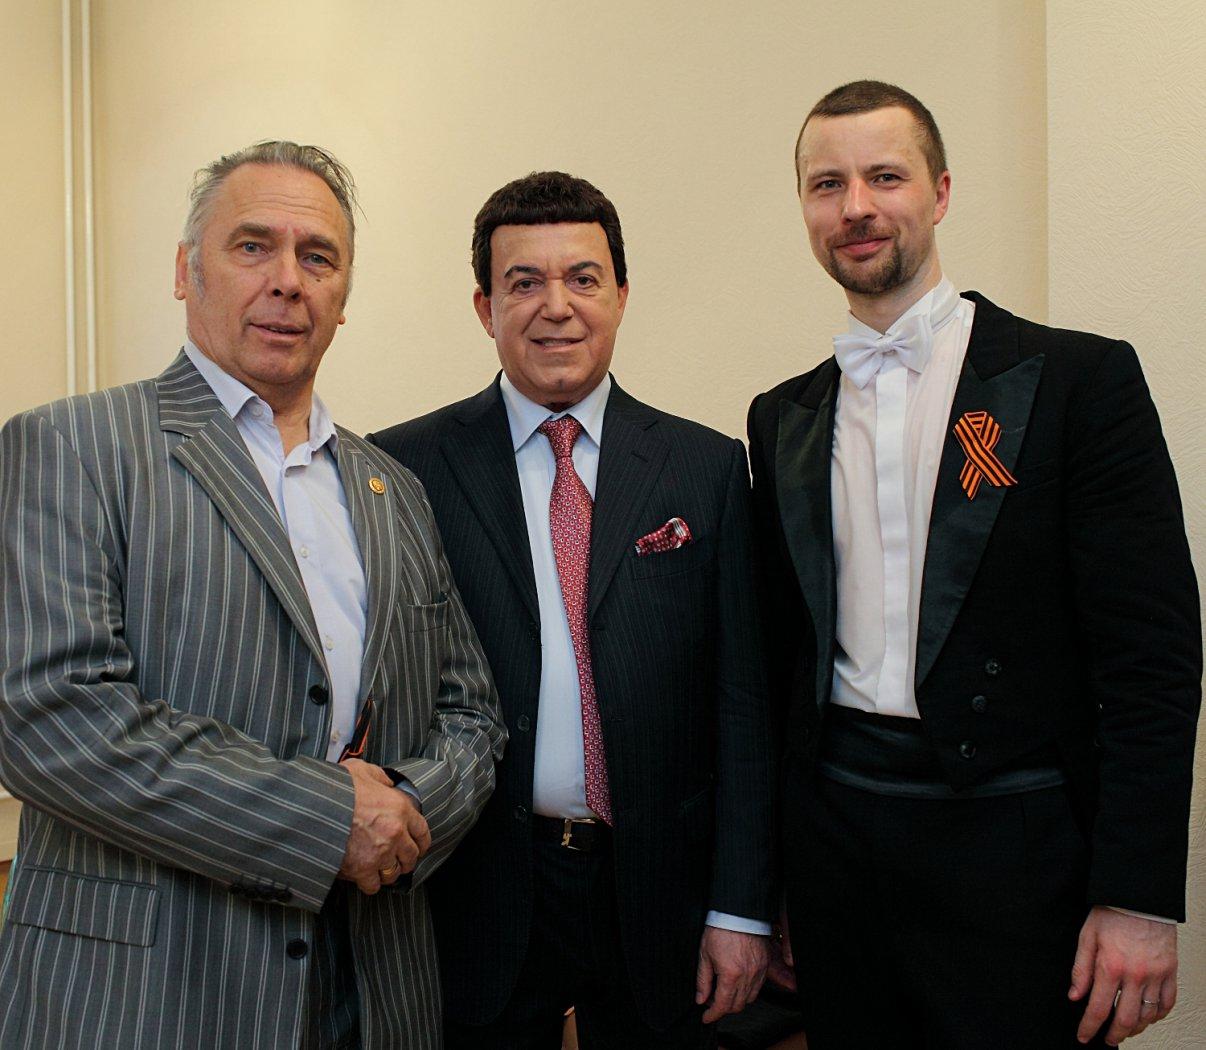 Владислав Иванович Пьявко, Иосиф Давыдович Кобзон, Владимир Шкуровский